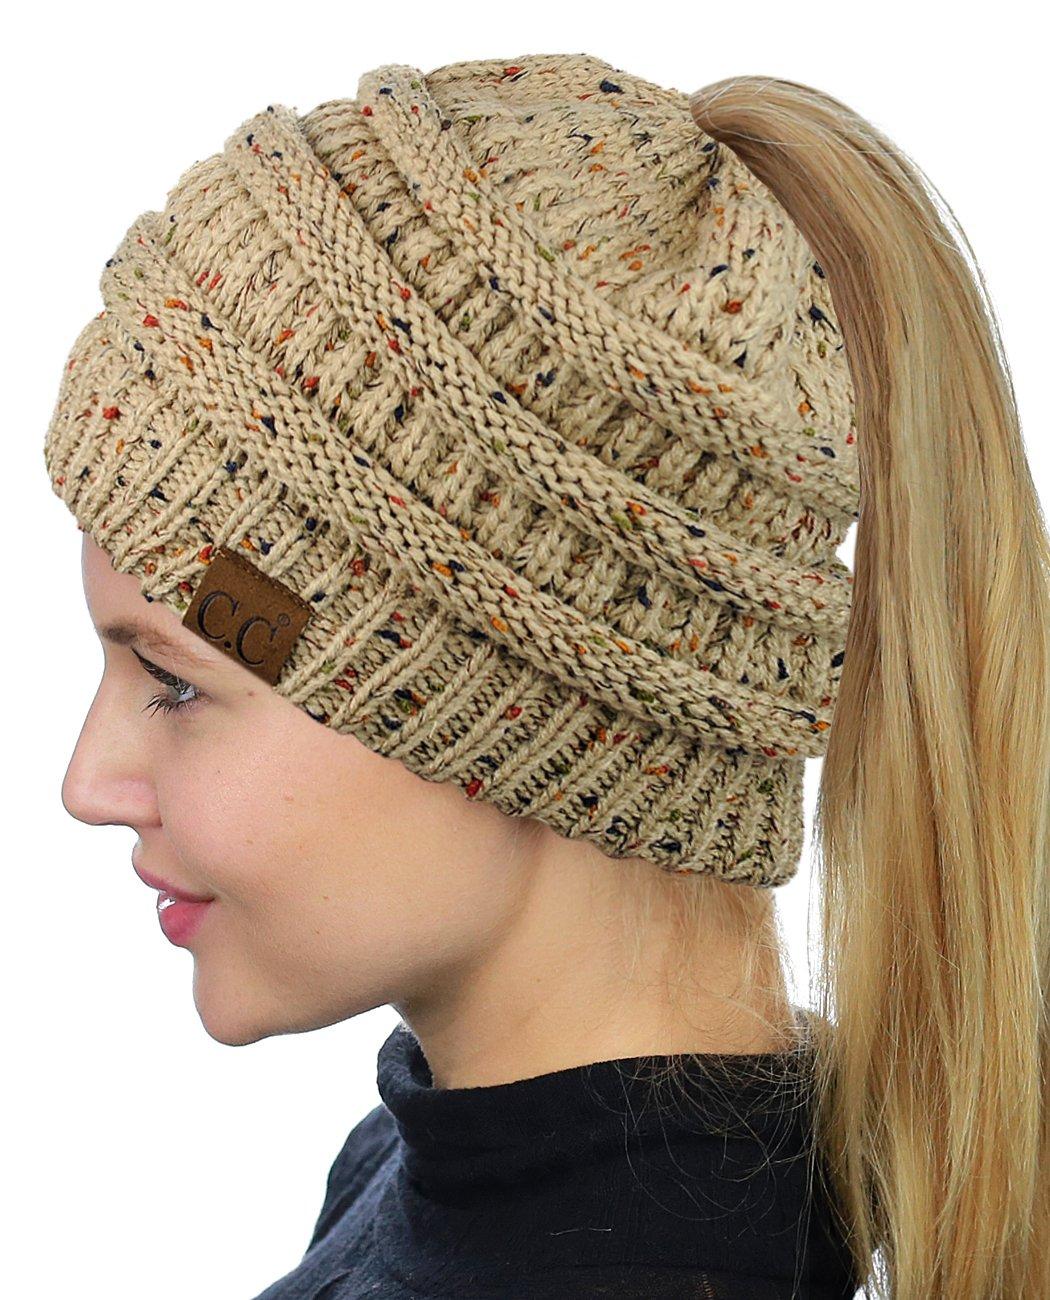 a085795fa83 Winter Hats For Women CC Ponytail Beanie Messy Bun Woolen Cap Ladies Knitted  Crochet Hat Multicolor Skullies Beanies Warm Caps